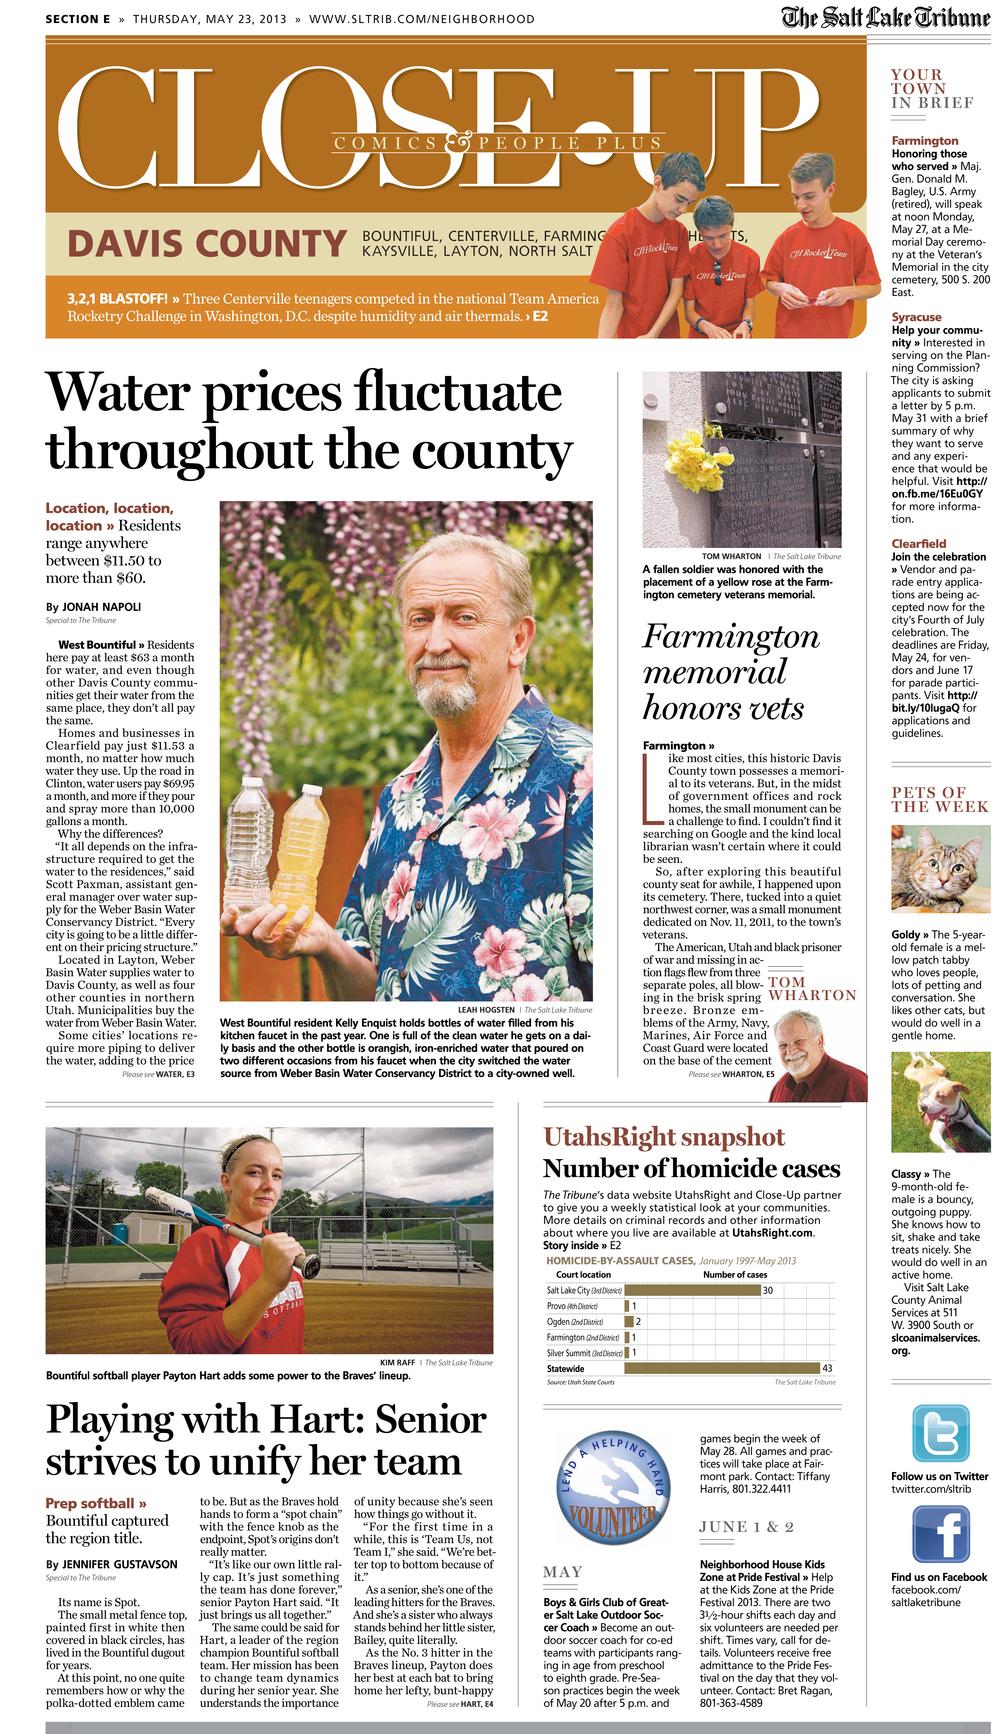 Tribune Page 1.jpg